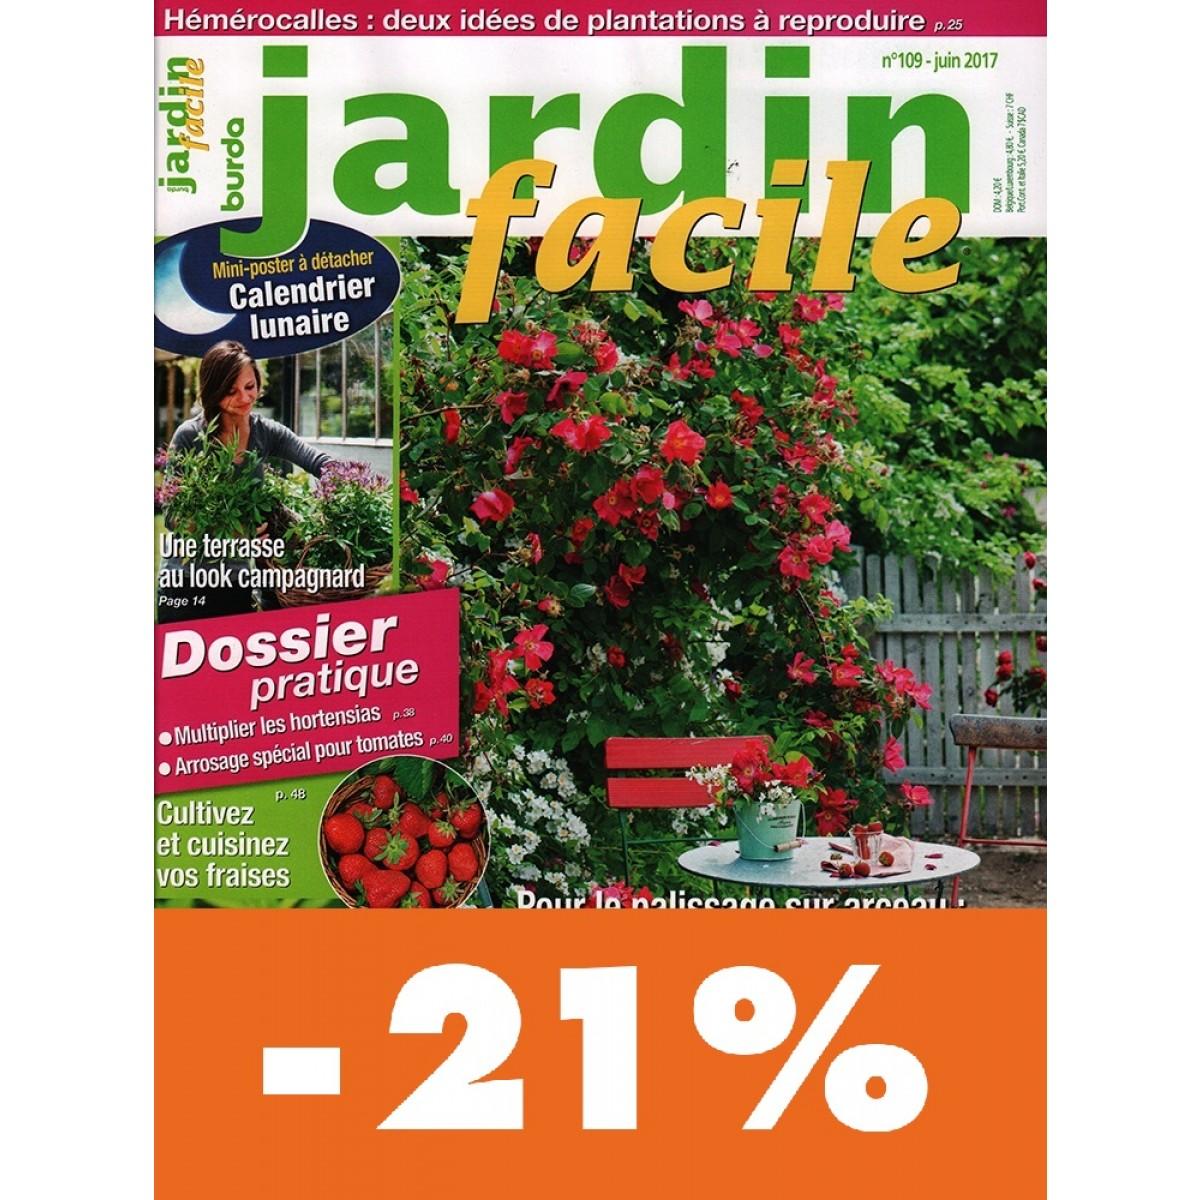 abonnement jardin facile pas cher mag24 discount. Black Bedroom Furniture Sets. Home Design Ideas